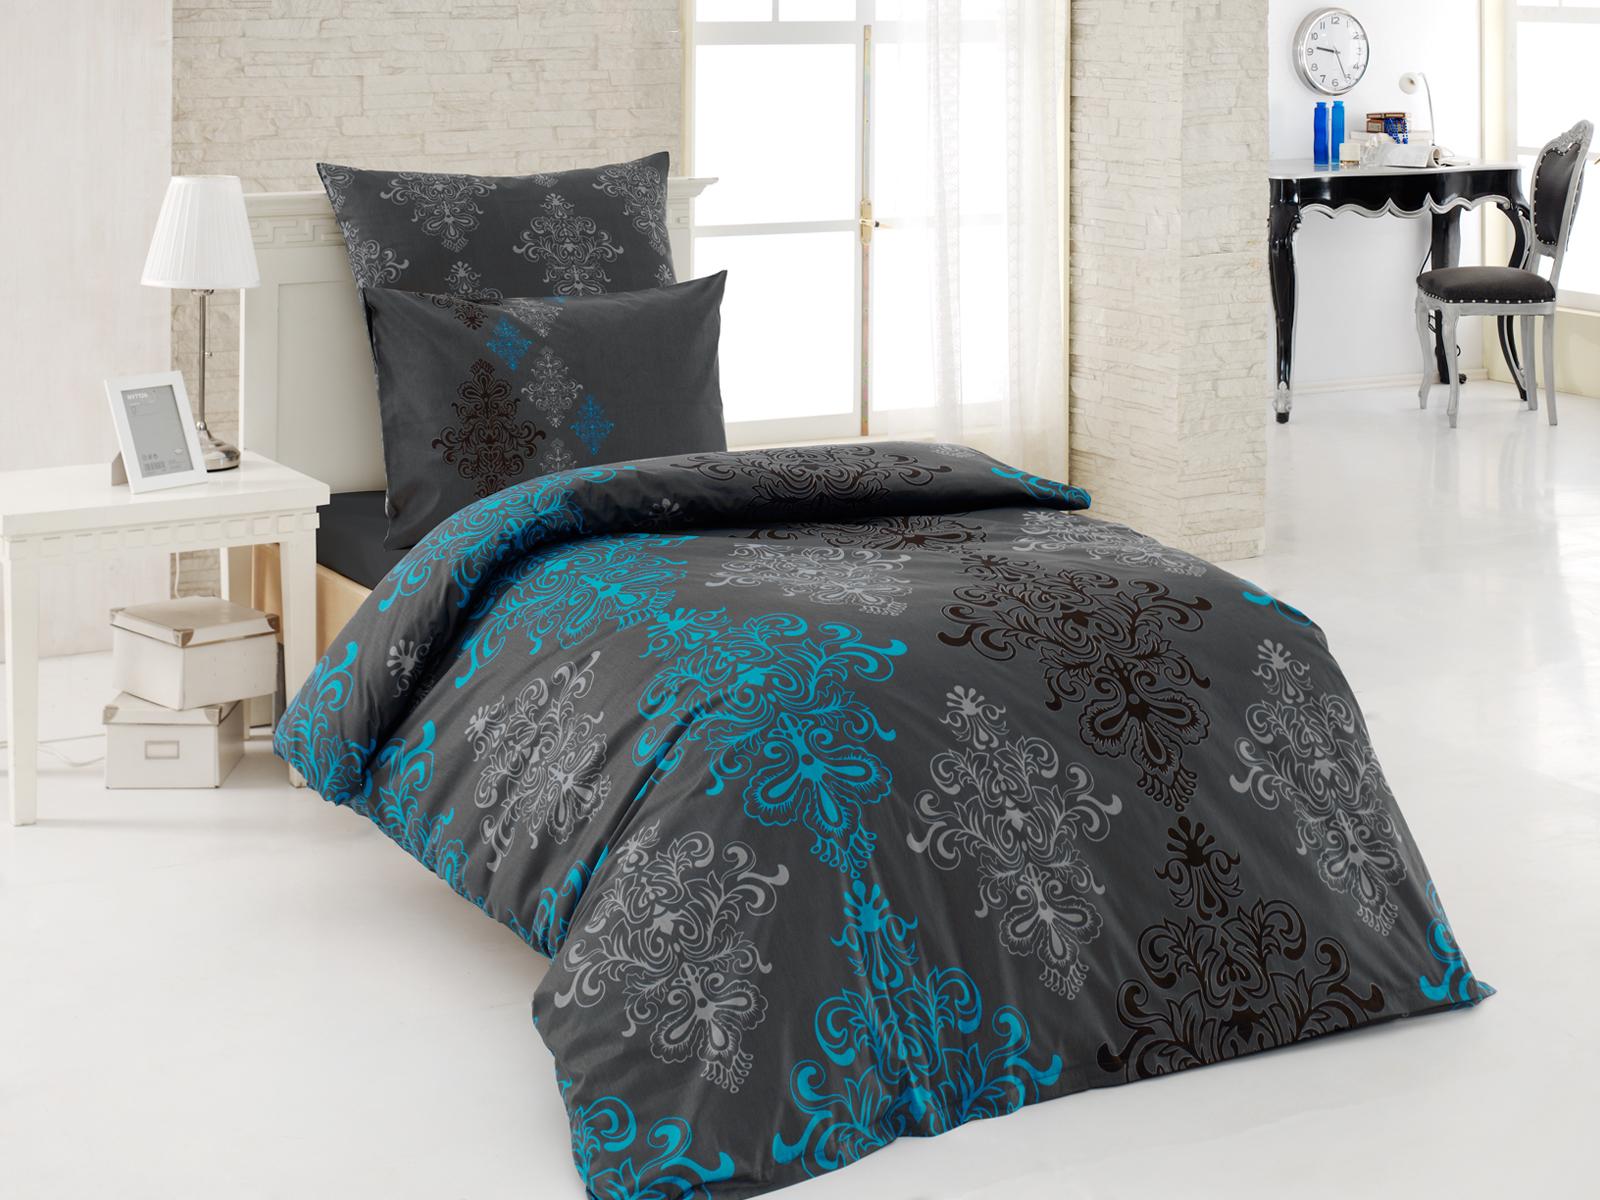 3 tlg renforce bettw sche 135x200 cm aura t rkis. Black Bedroom Furniture Sets. Home Design Ideas